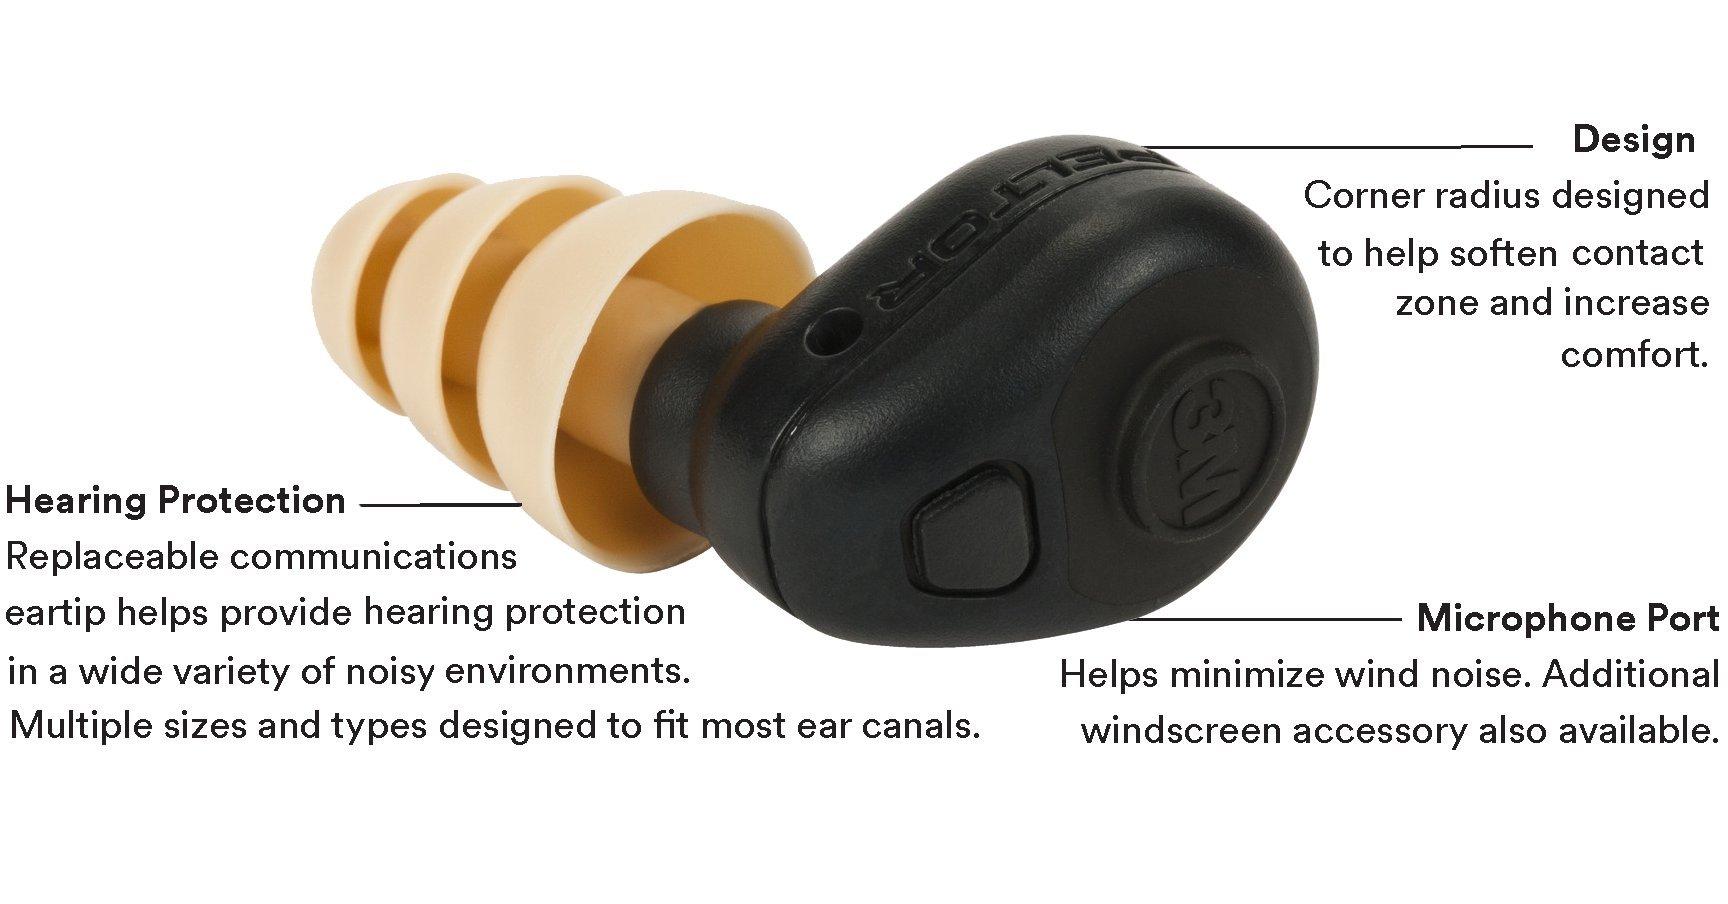 3M Personal Protective Equipment PELTOR 93824 Tactical Earplug, TEP-200 by 3M Personal Protective Equipment (Image #3)